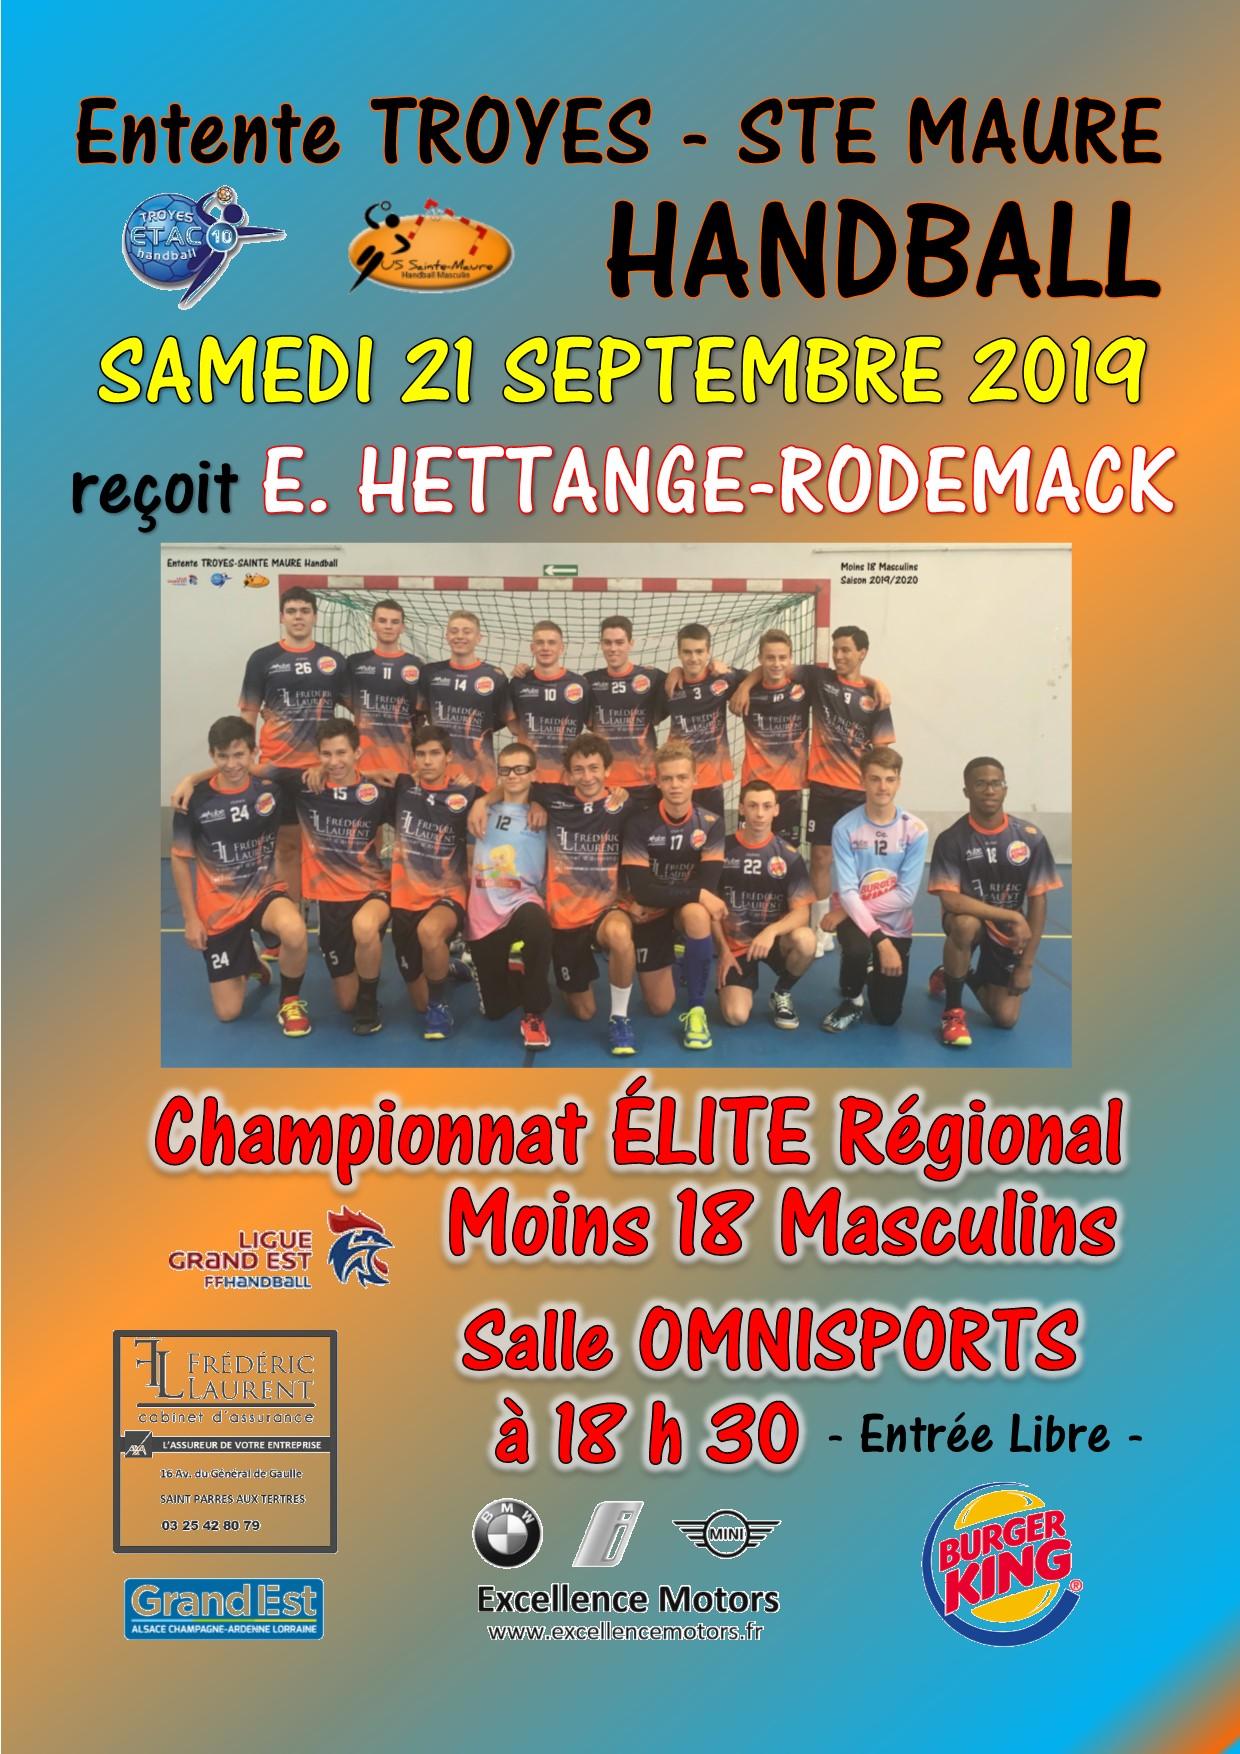 Salle Omnisports - Samedi 21 septembre 2019